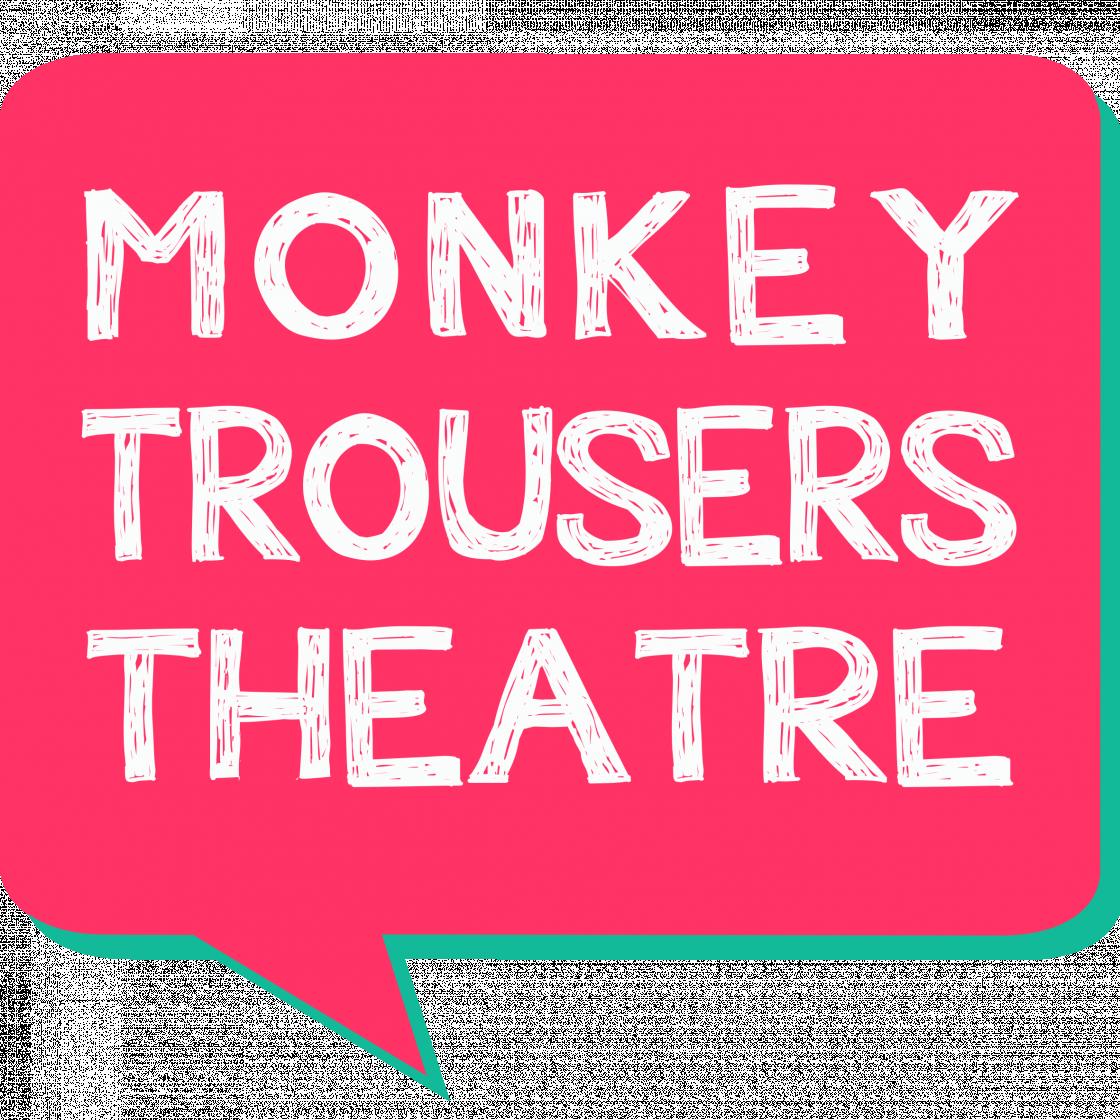 Monkey Trousers Theatre logo